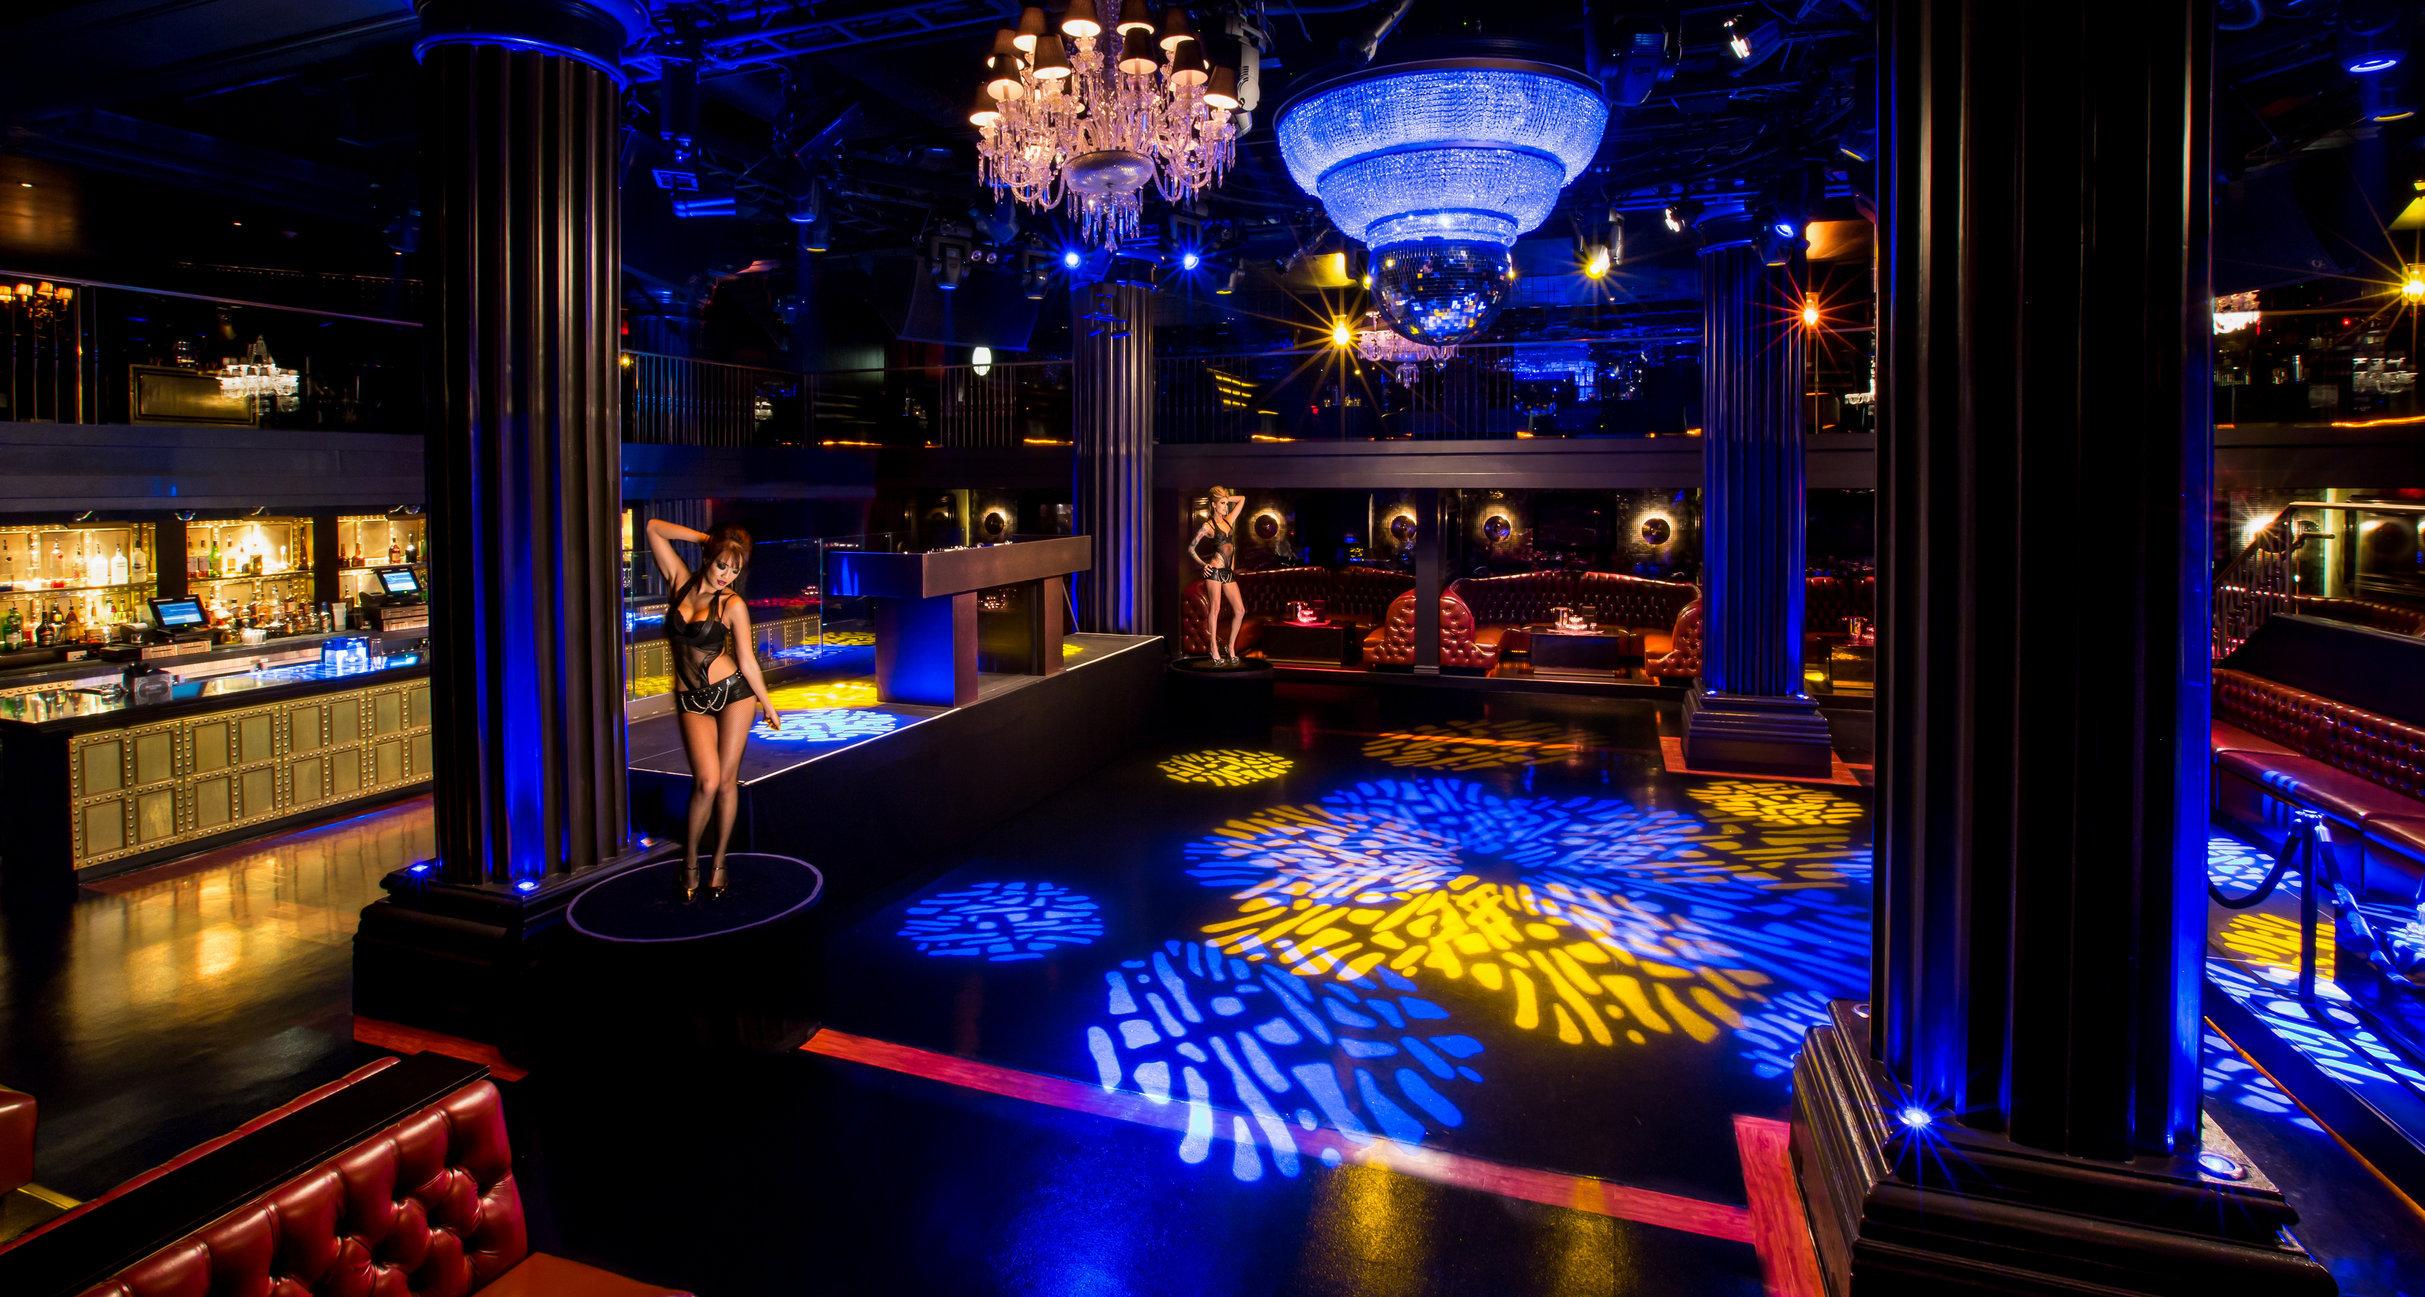 BE_SIDE_DANCE_GIRLS_LAYERS.jpg